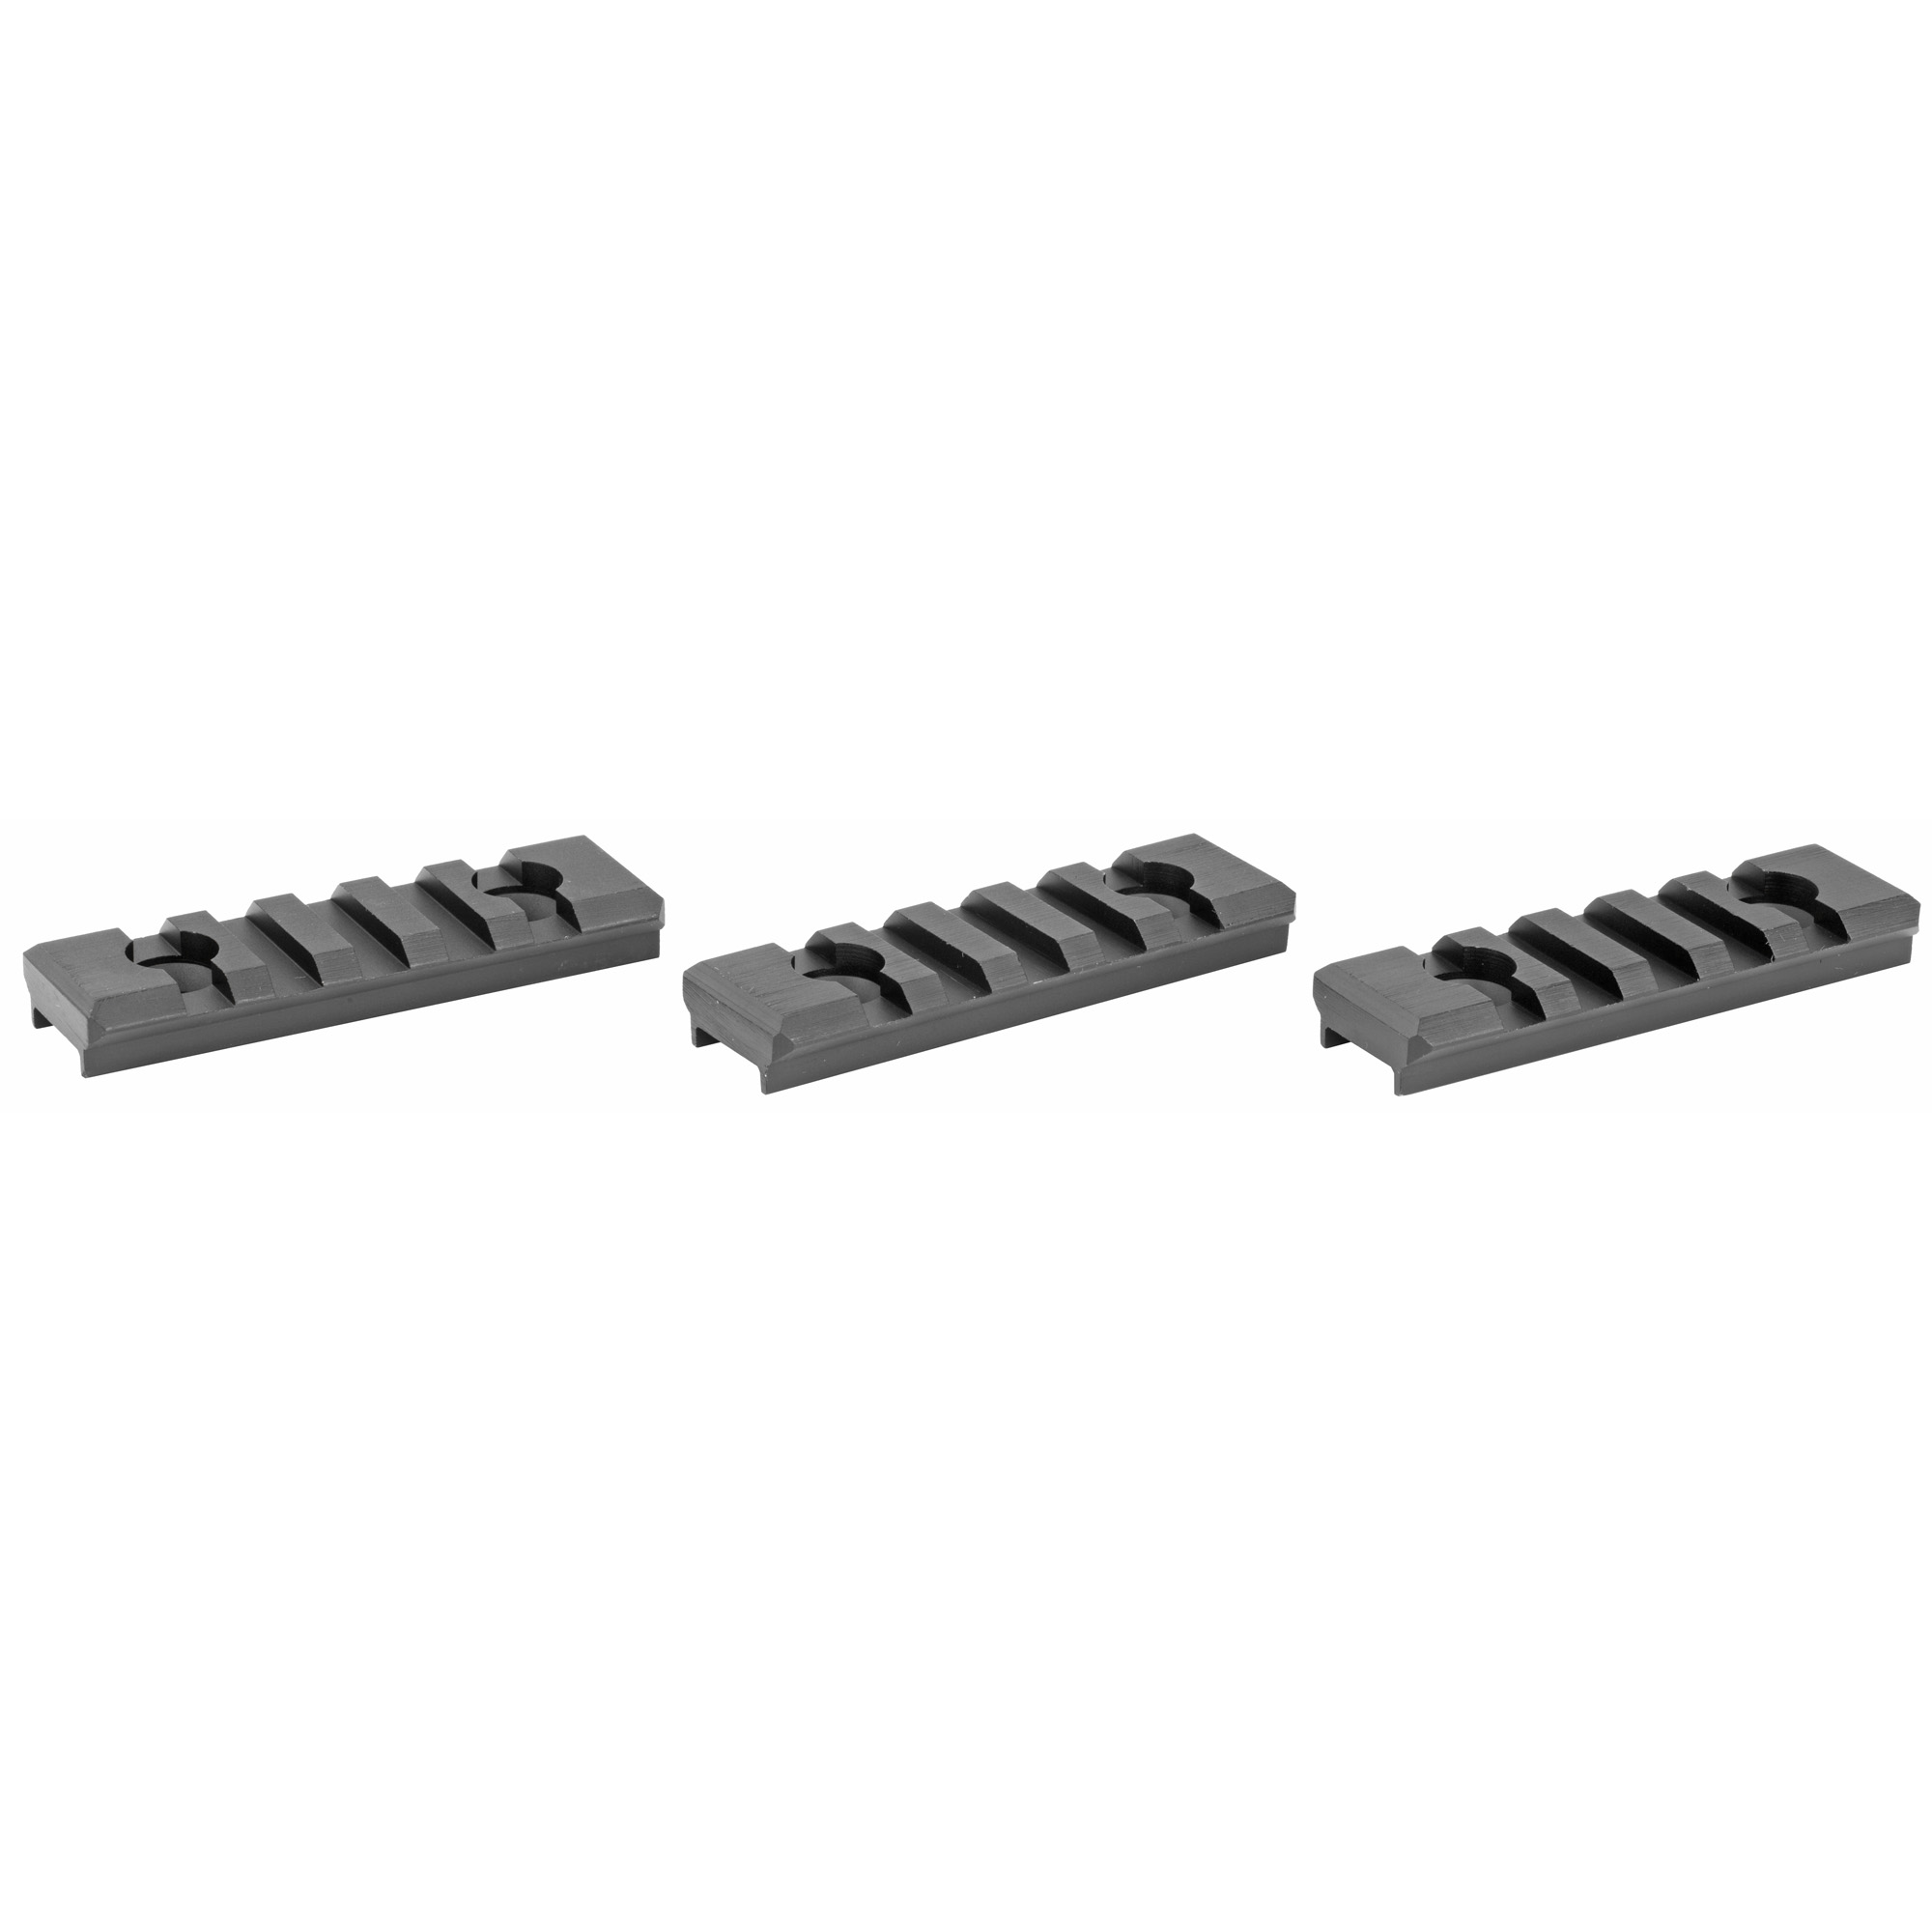 "Diamondhead's VRS 2"" Short Rail Section"" 3-Pack"" for Diamondhead VRS (Versa-Rail System) free floating and drop in AR-15 handguards"" is threaded for Mil-Std 1913 Picatinny rail applications."